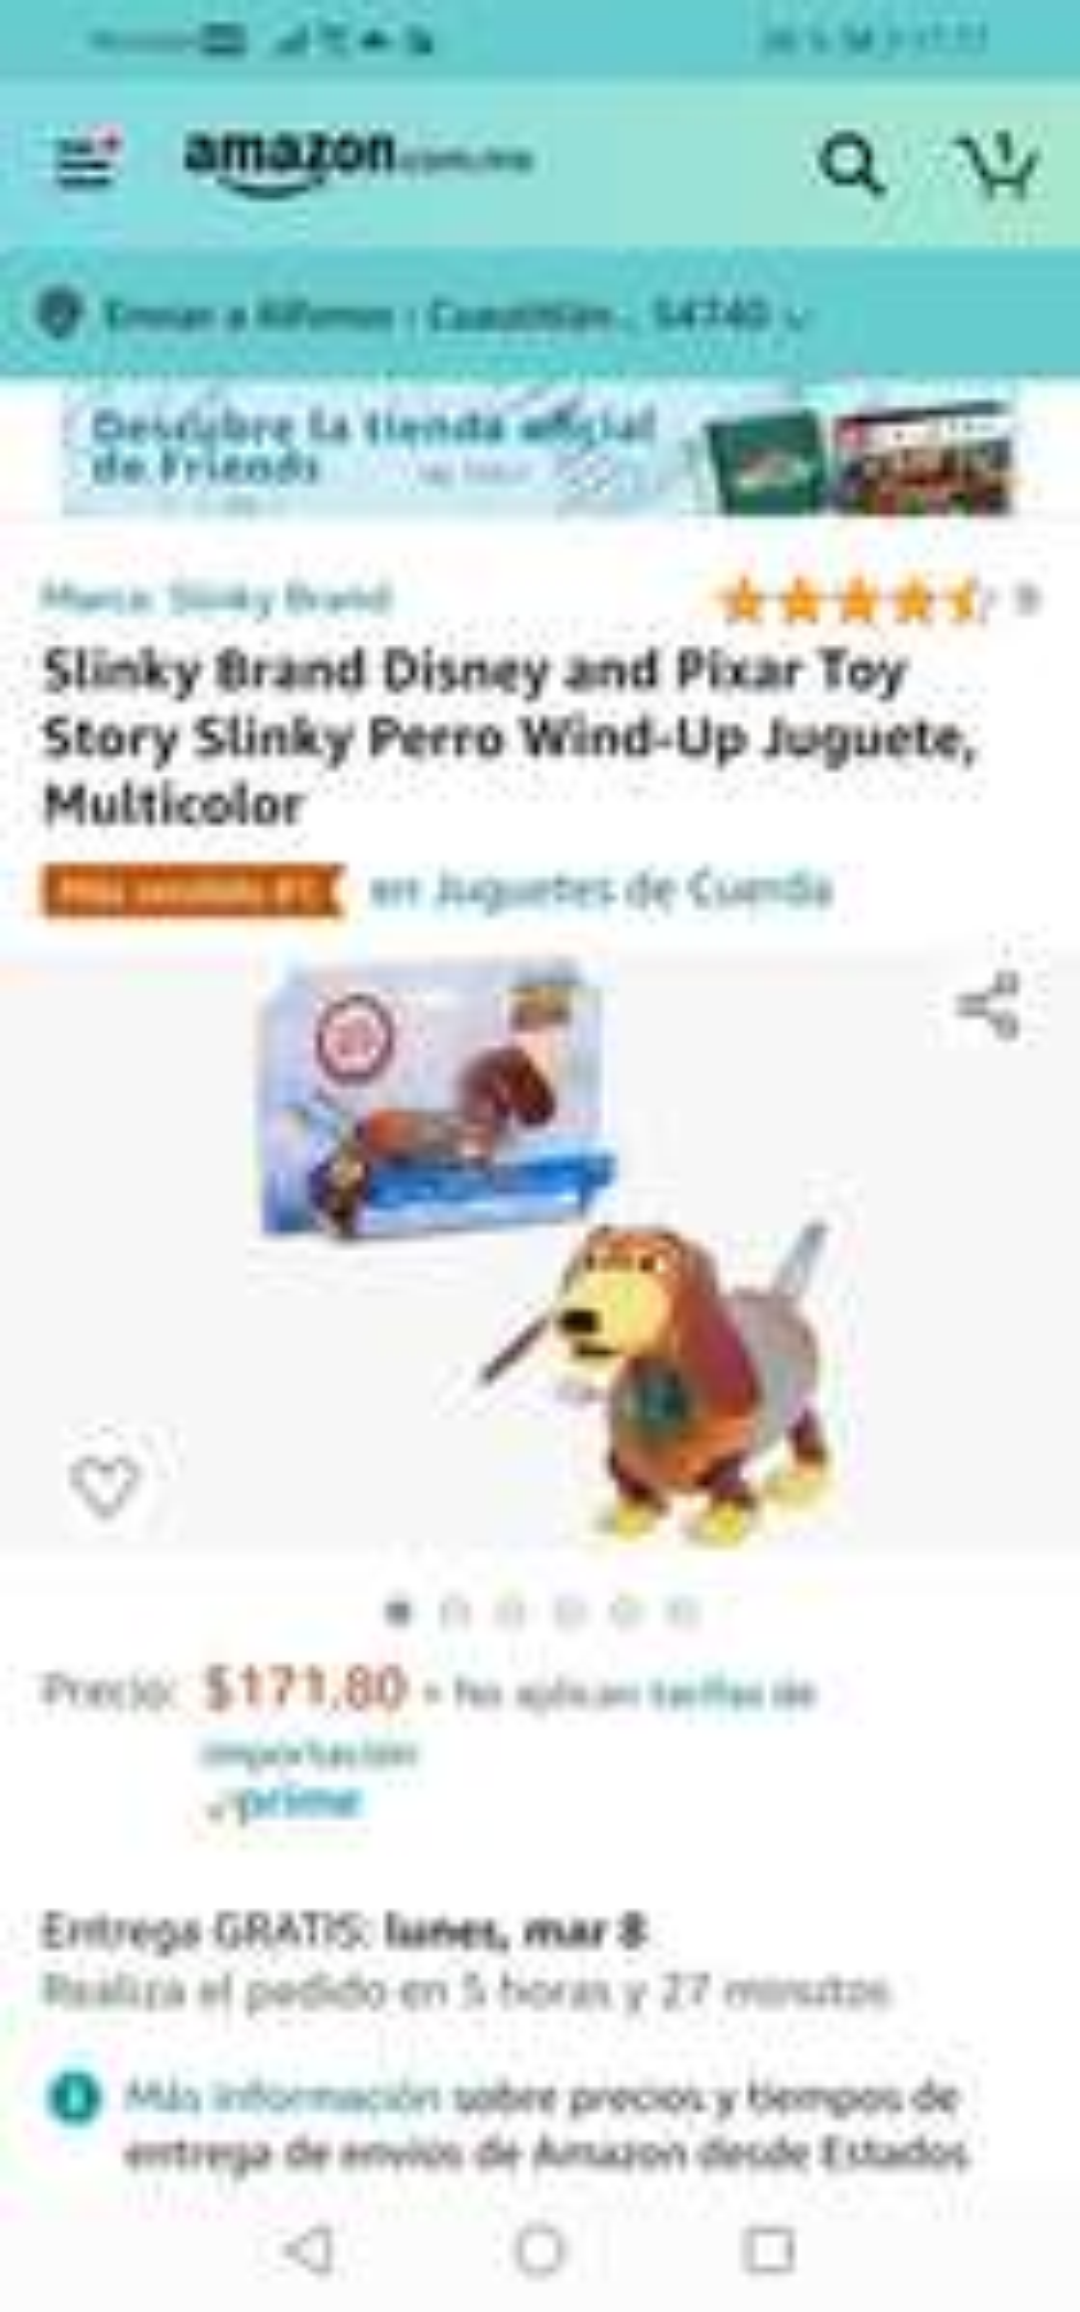 Amazon: Slinky Brand Disney and Pixar Toy Story Slinky Perro Wind-Up Juguete, Multicolor